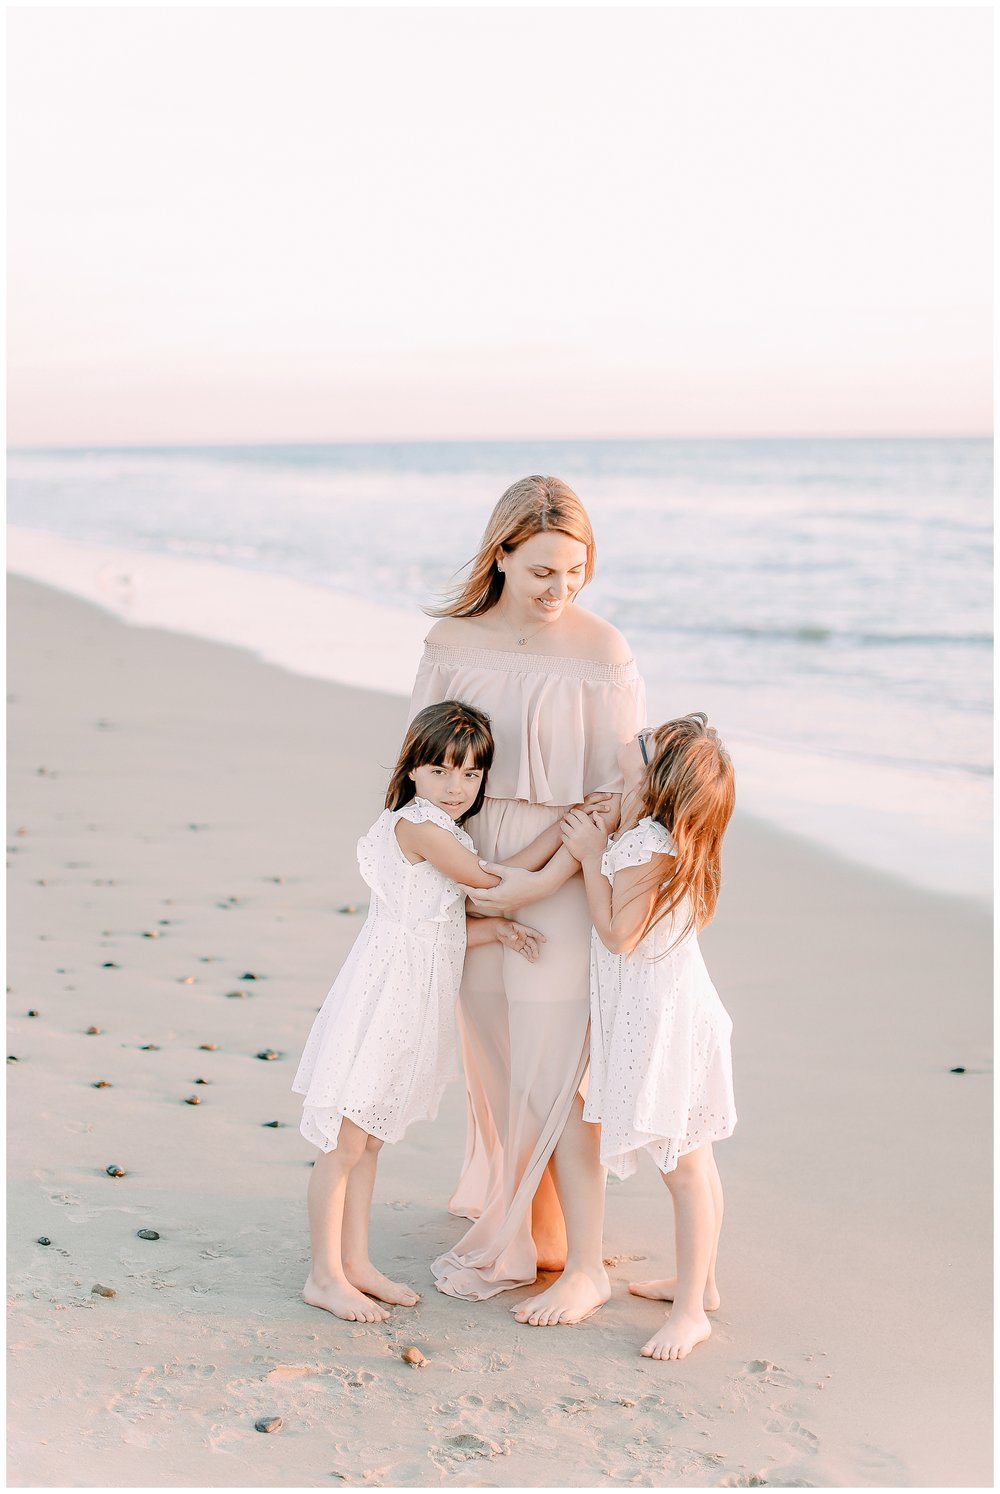 San_clemente_family_session_Orange_county_family_photographer_cori_kleckner_photography_laguna_beach_family_session_0691.jpg